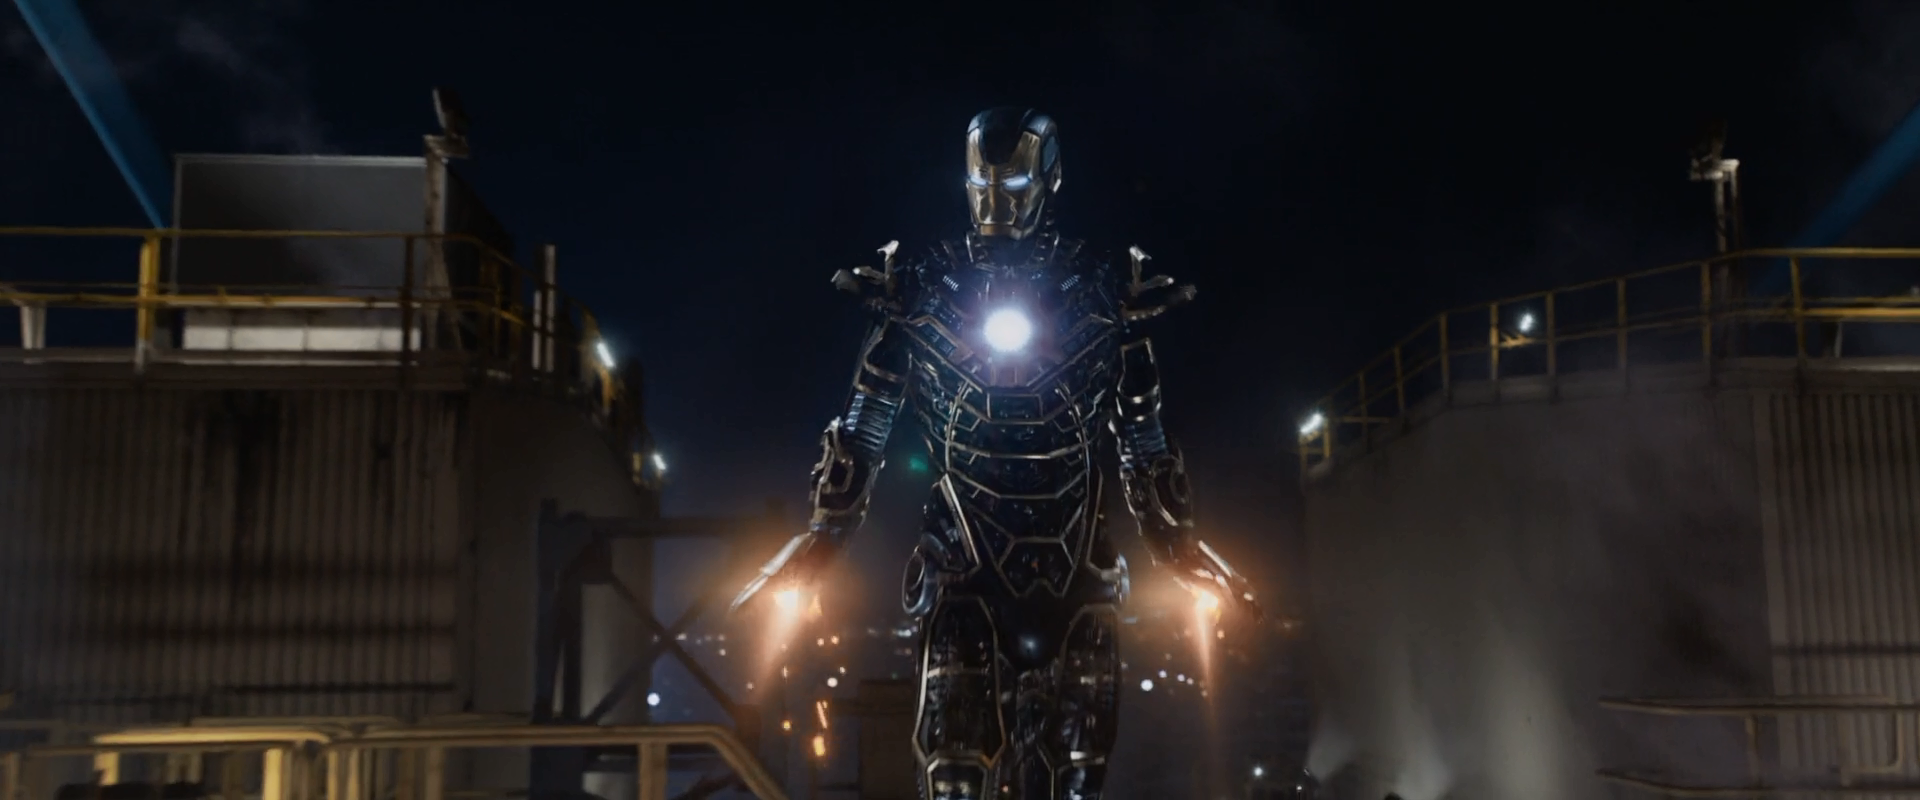 B.O.N.E. Armor